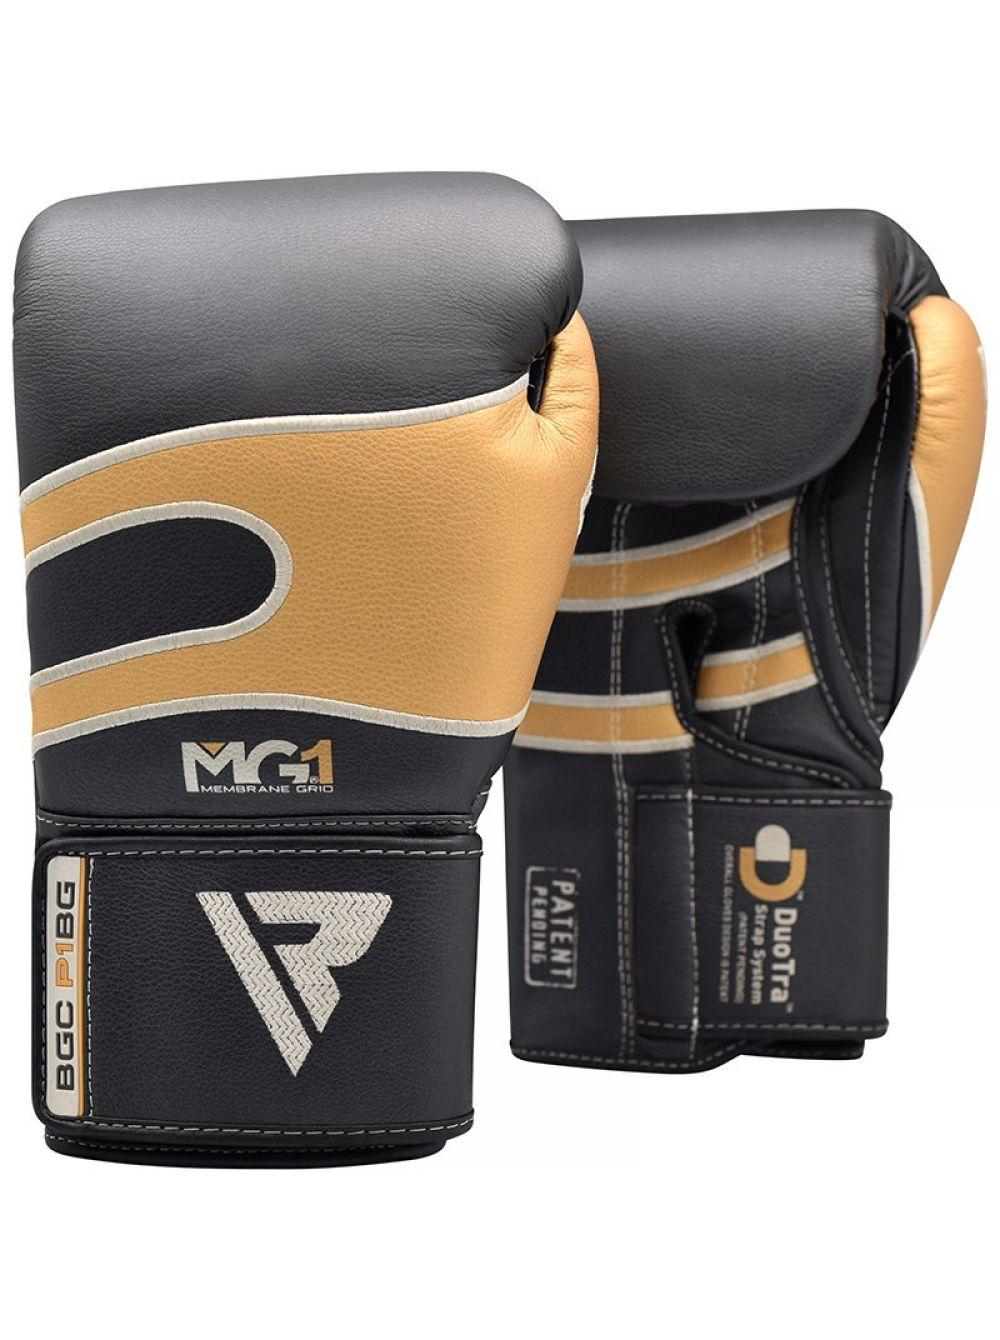 Купить Перчатки для бокса RDX Boxing Glove BGC-P1 Black/Gold, 6376_bk_gd